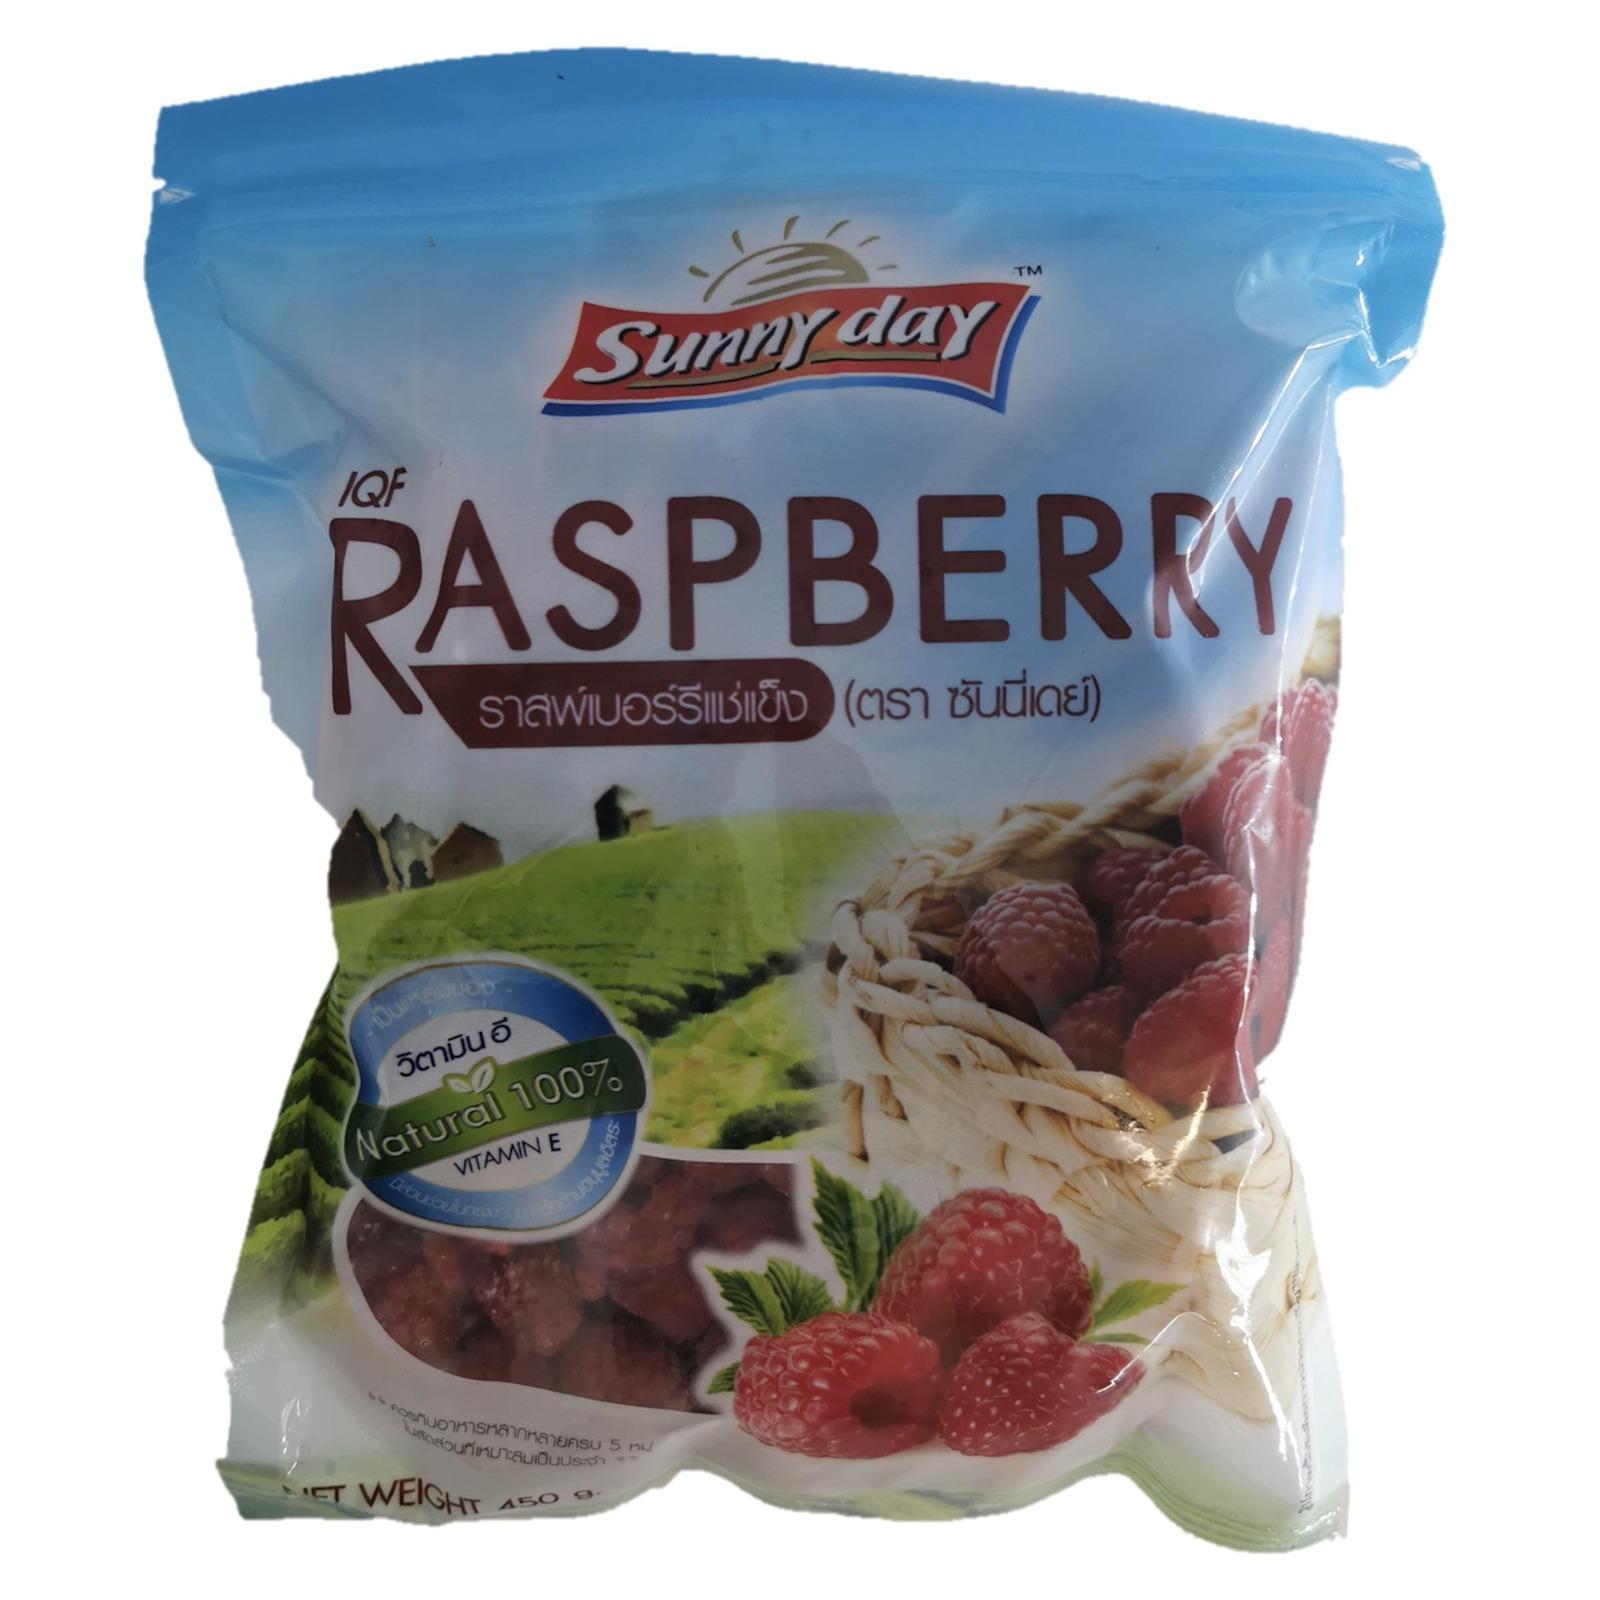 Sunny Days IQF Raspberry